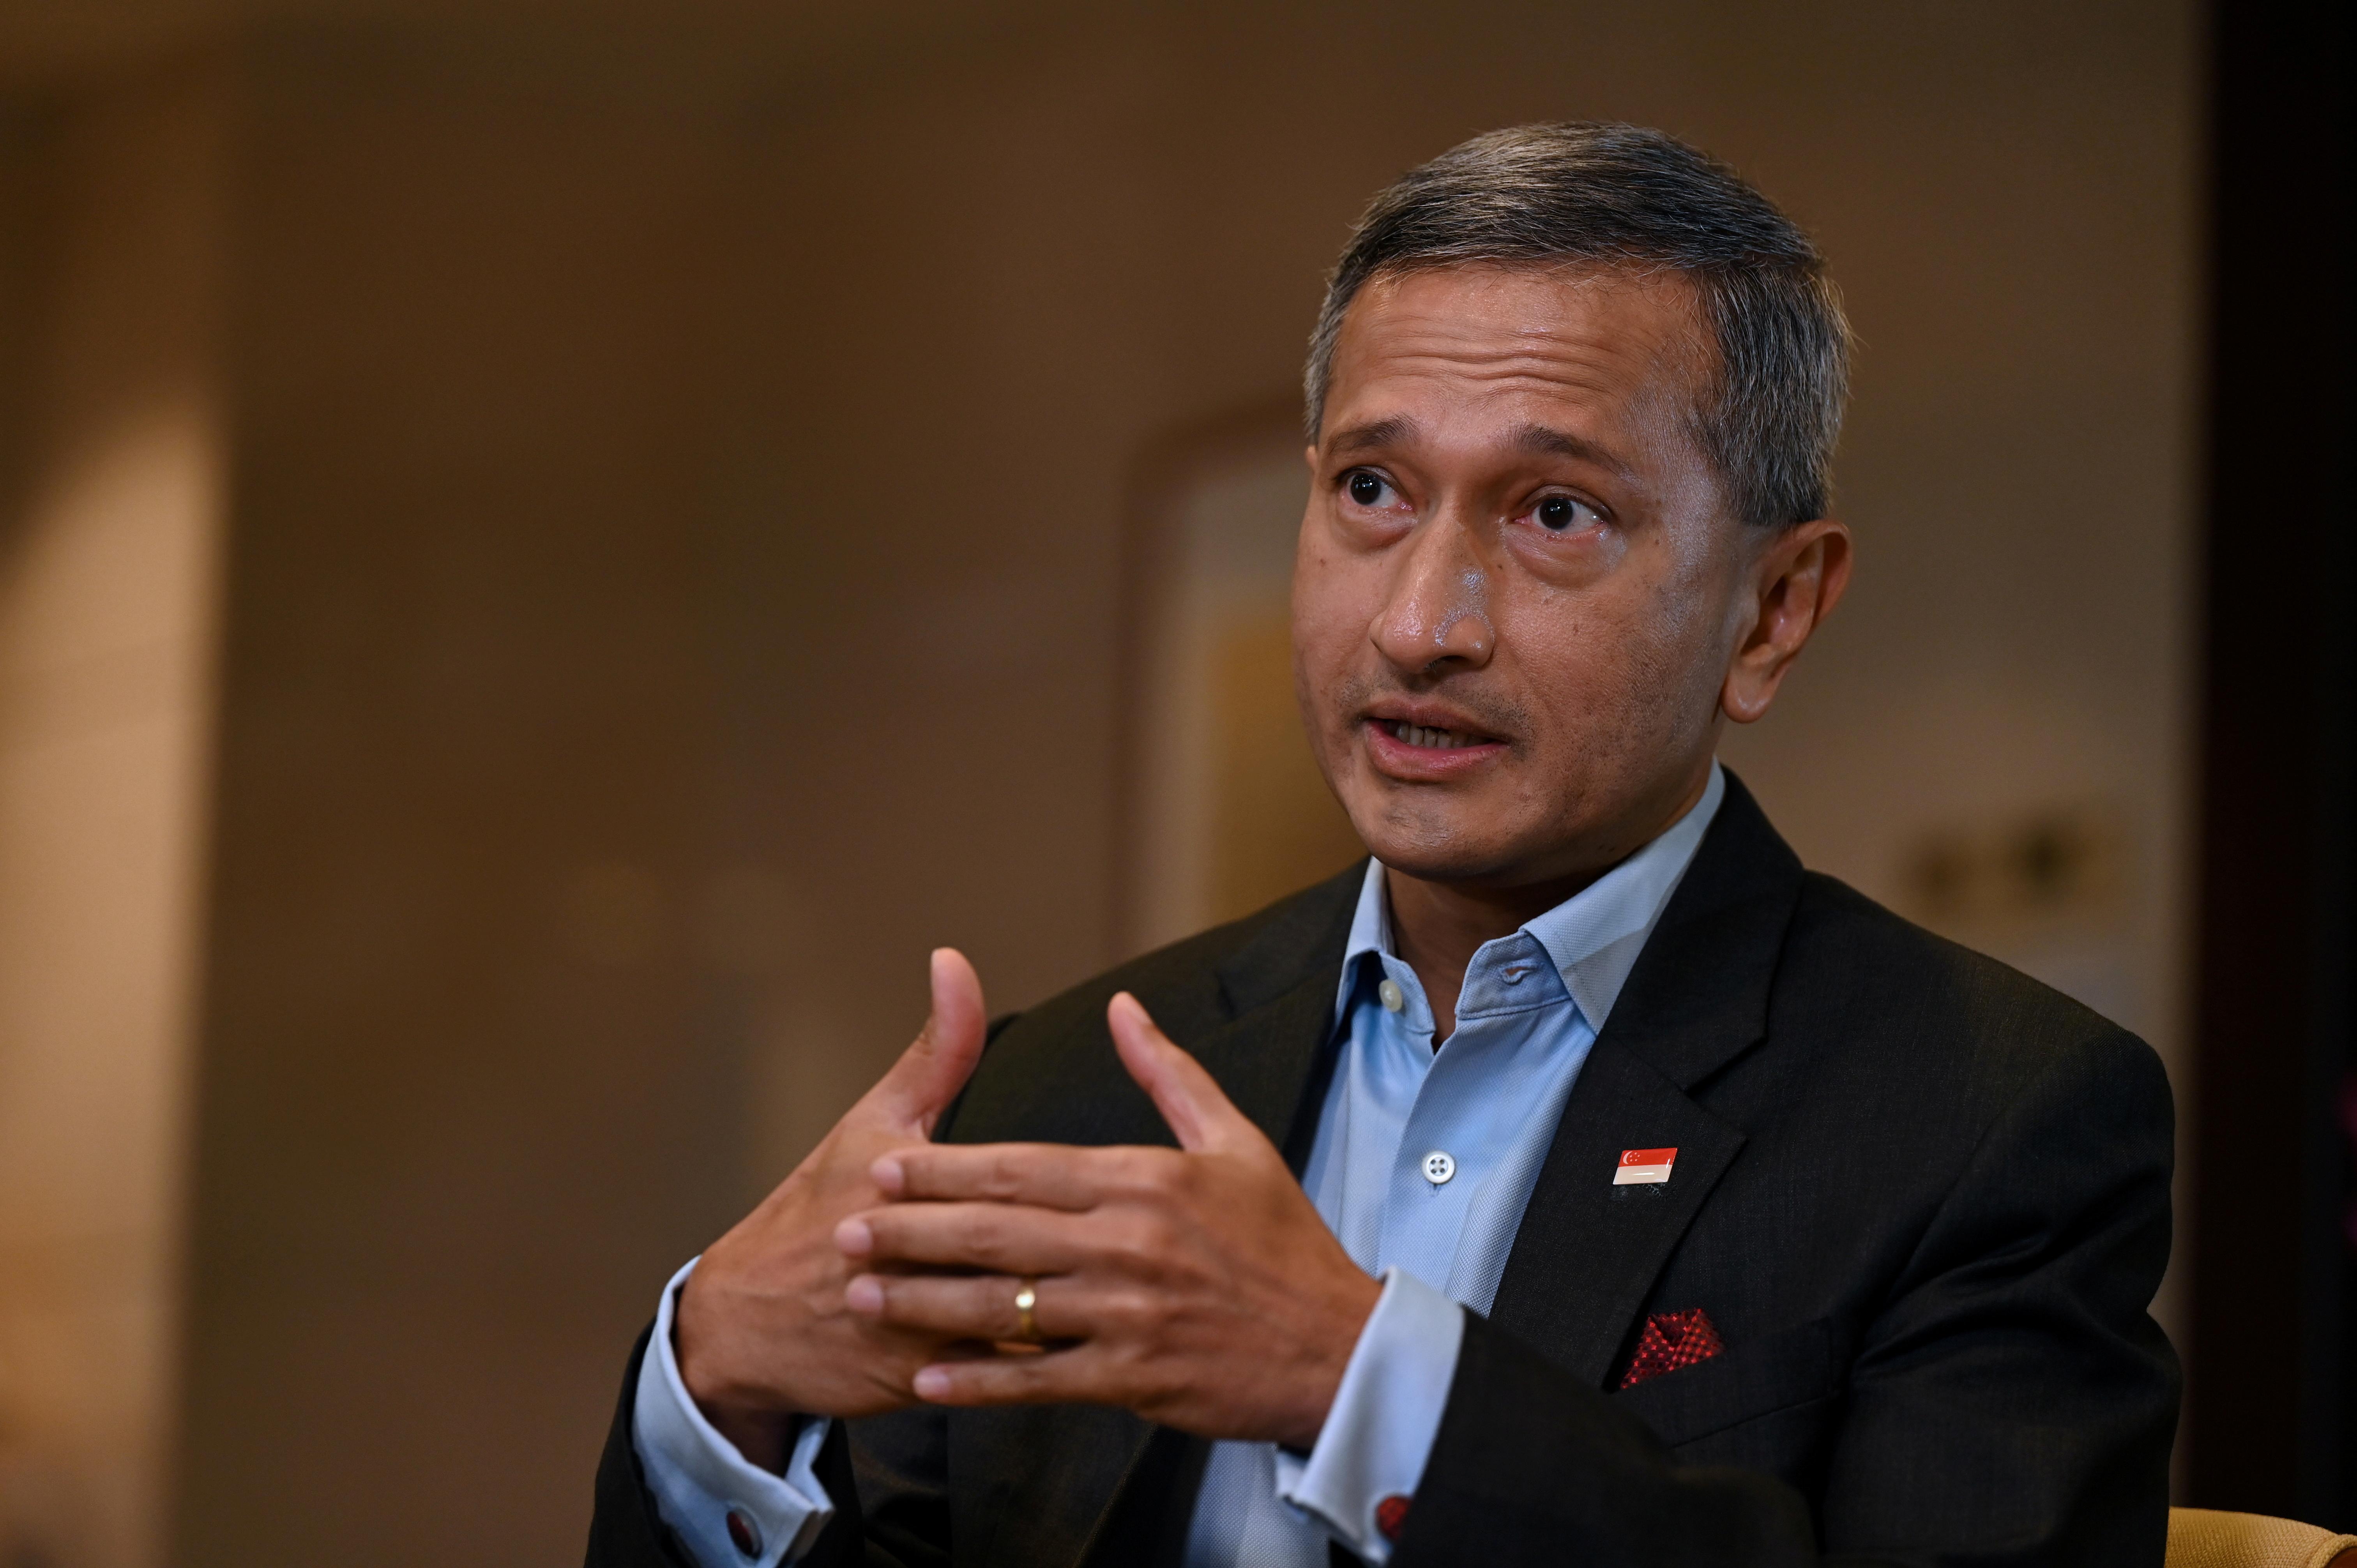 Singapore says ASEAN not as effective as hoped in Myanmar